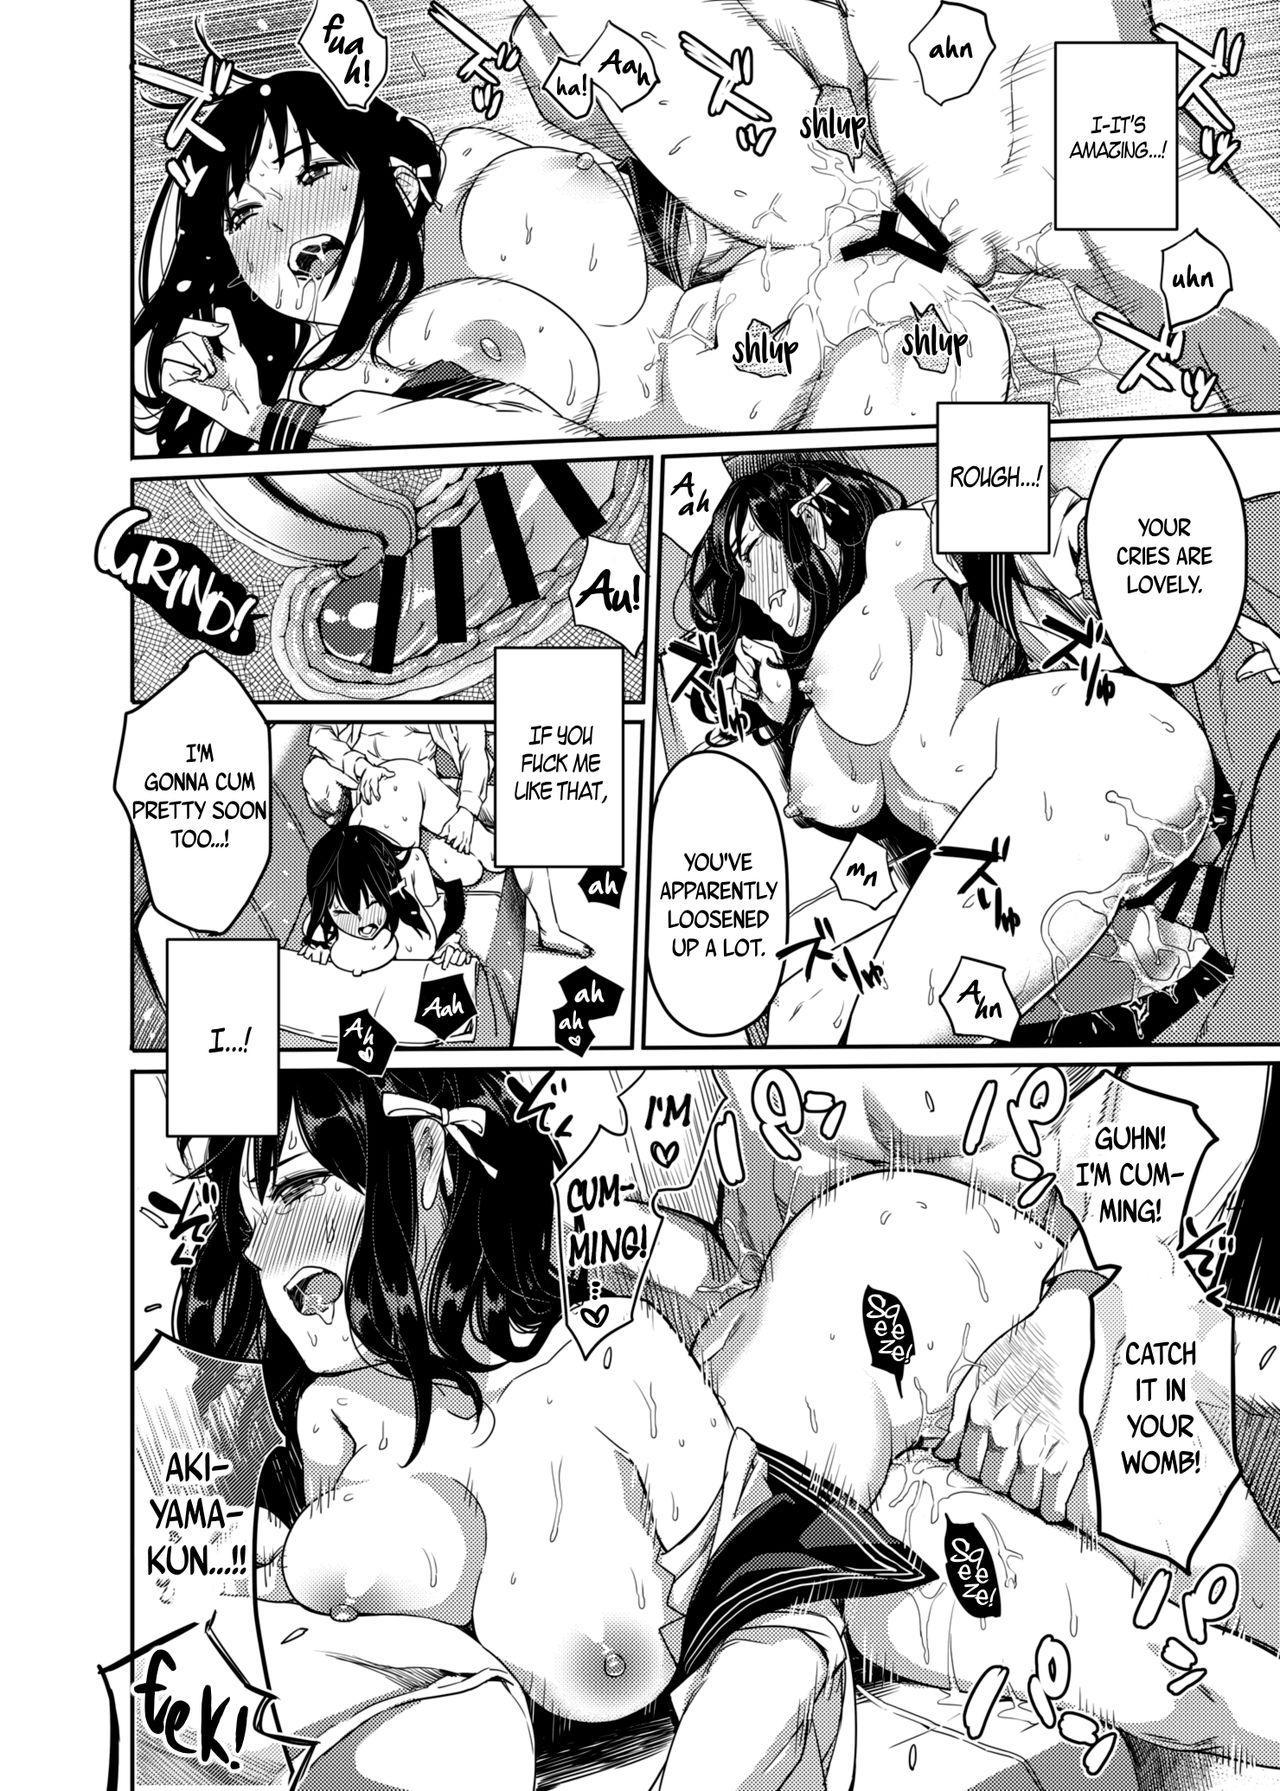 [Issun Kobo (Sukunahiko)] Houkago Doll - Akiyama Mari no Hamerare Kata | After-School Doll – How Akiyama Mari Gets Fucked [English] [B.E.C. Scans] [Digital] 18